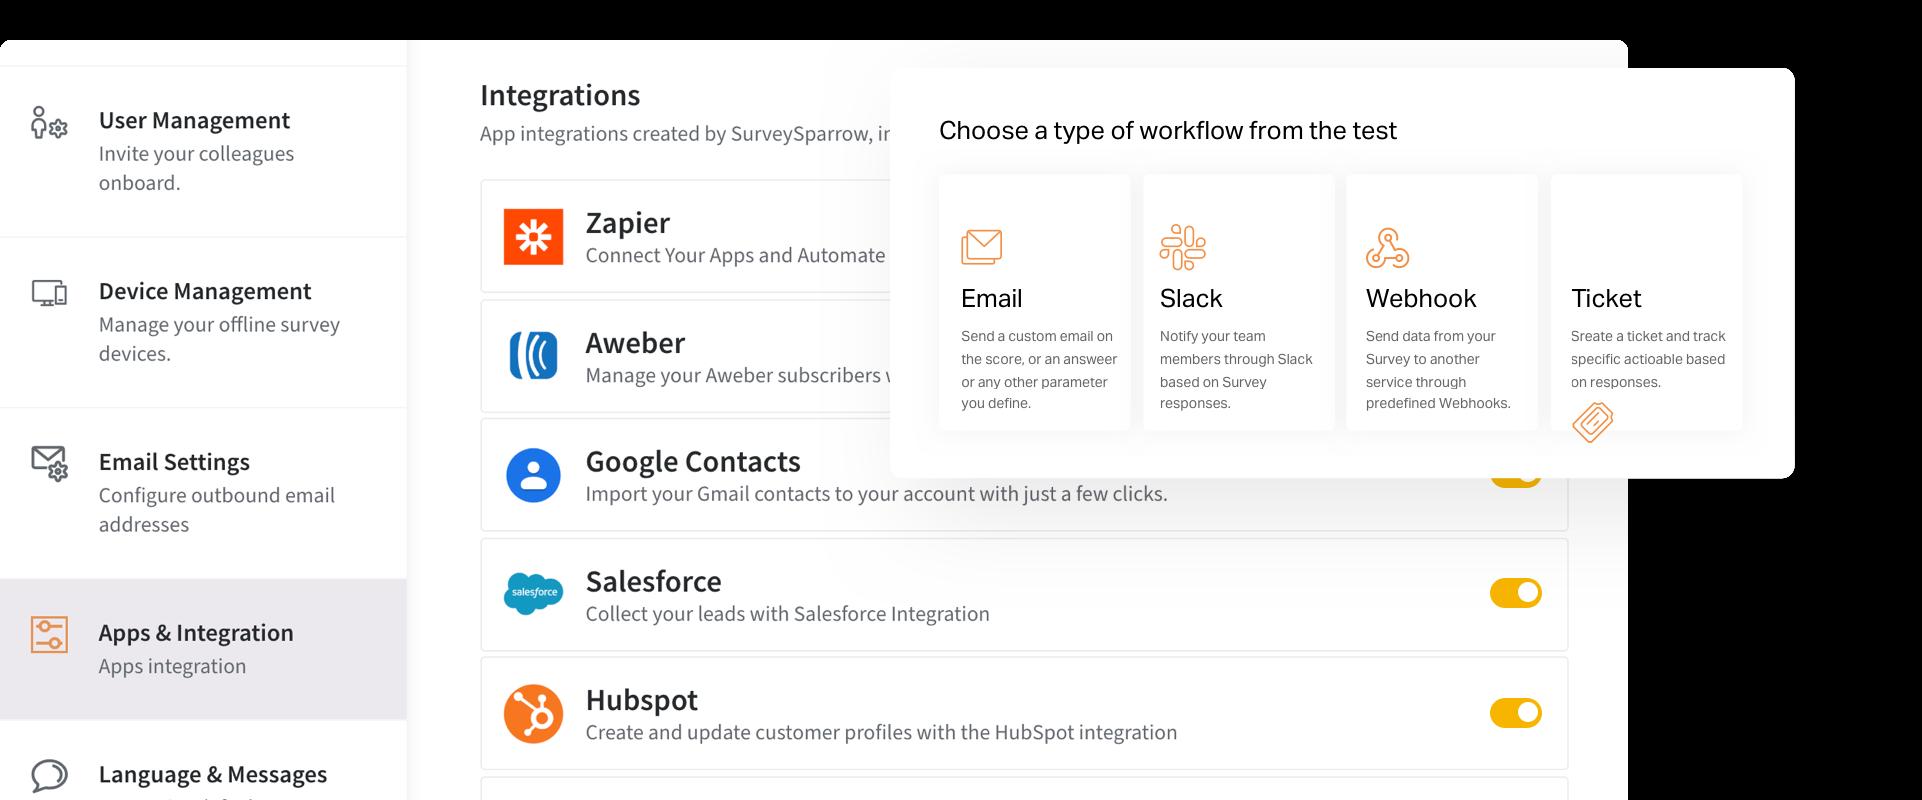 Integraciones nativas, API y Webhooks